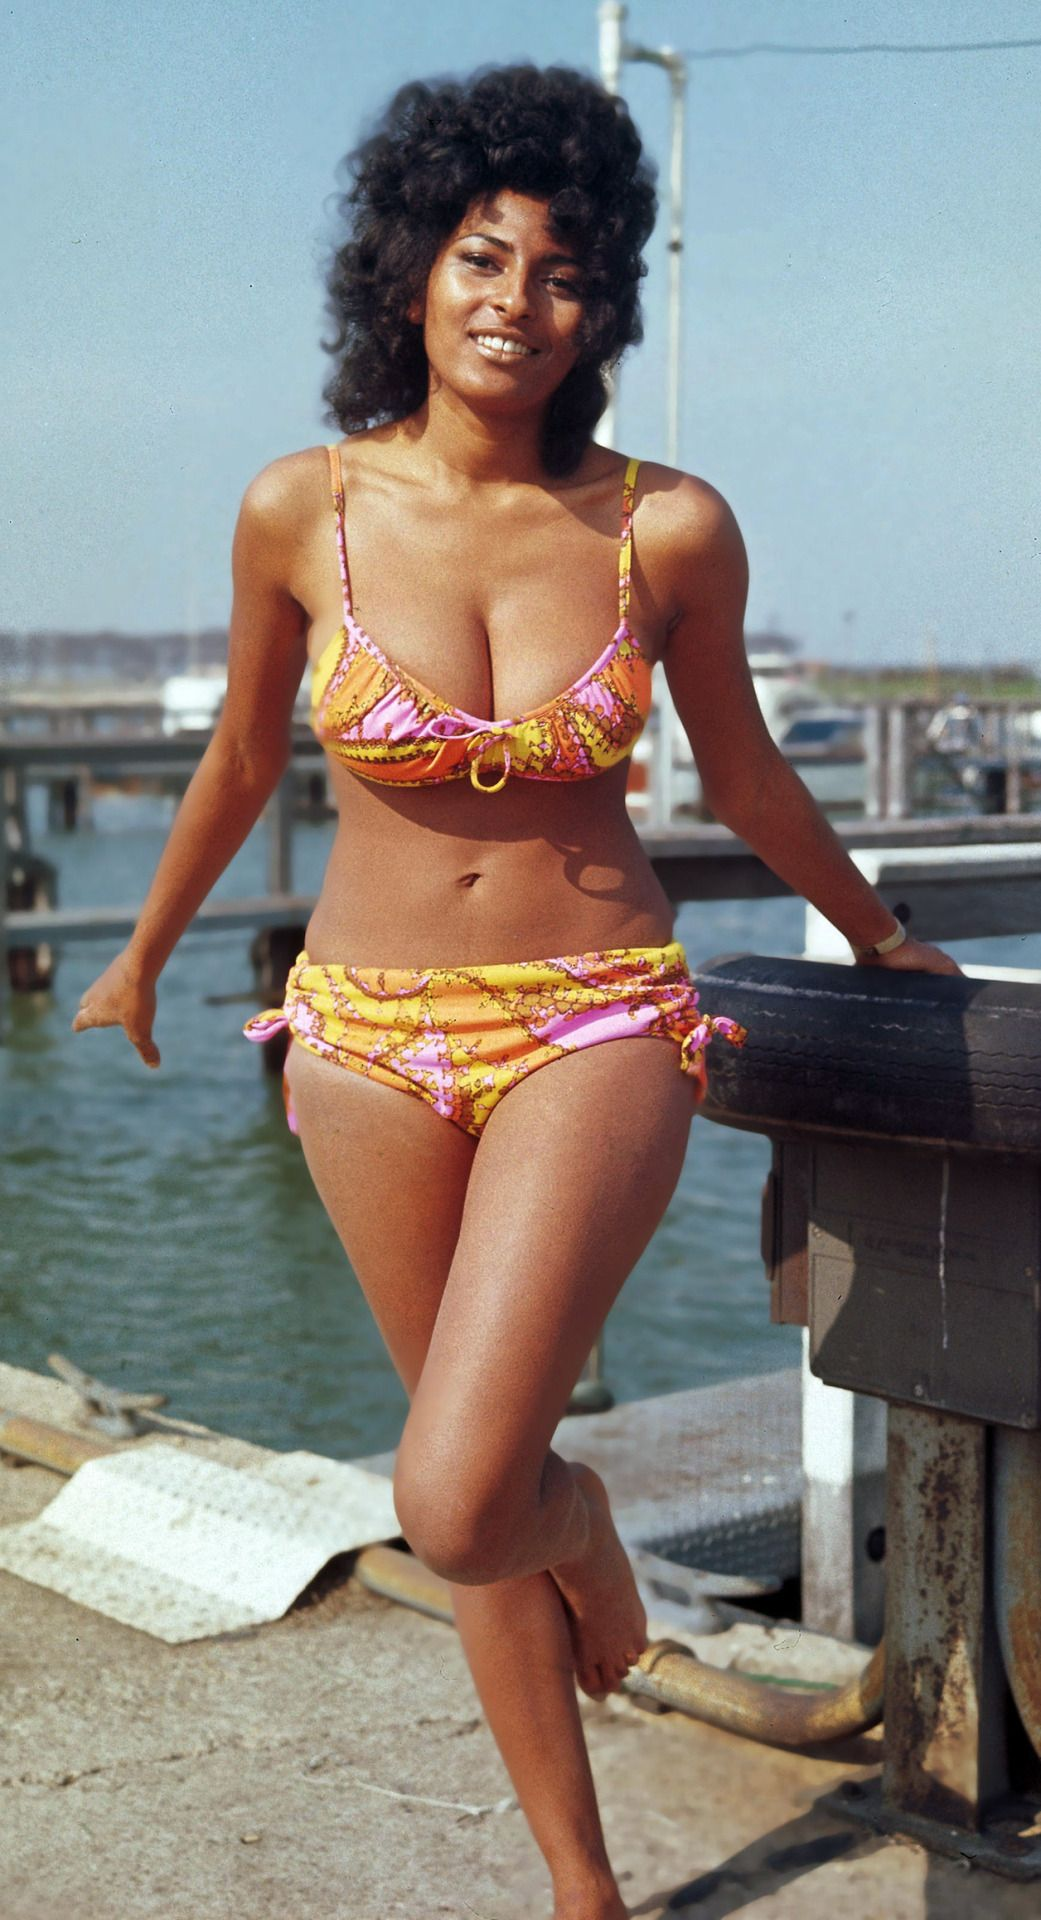 Bikini Pam Grier nude photos 2019